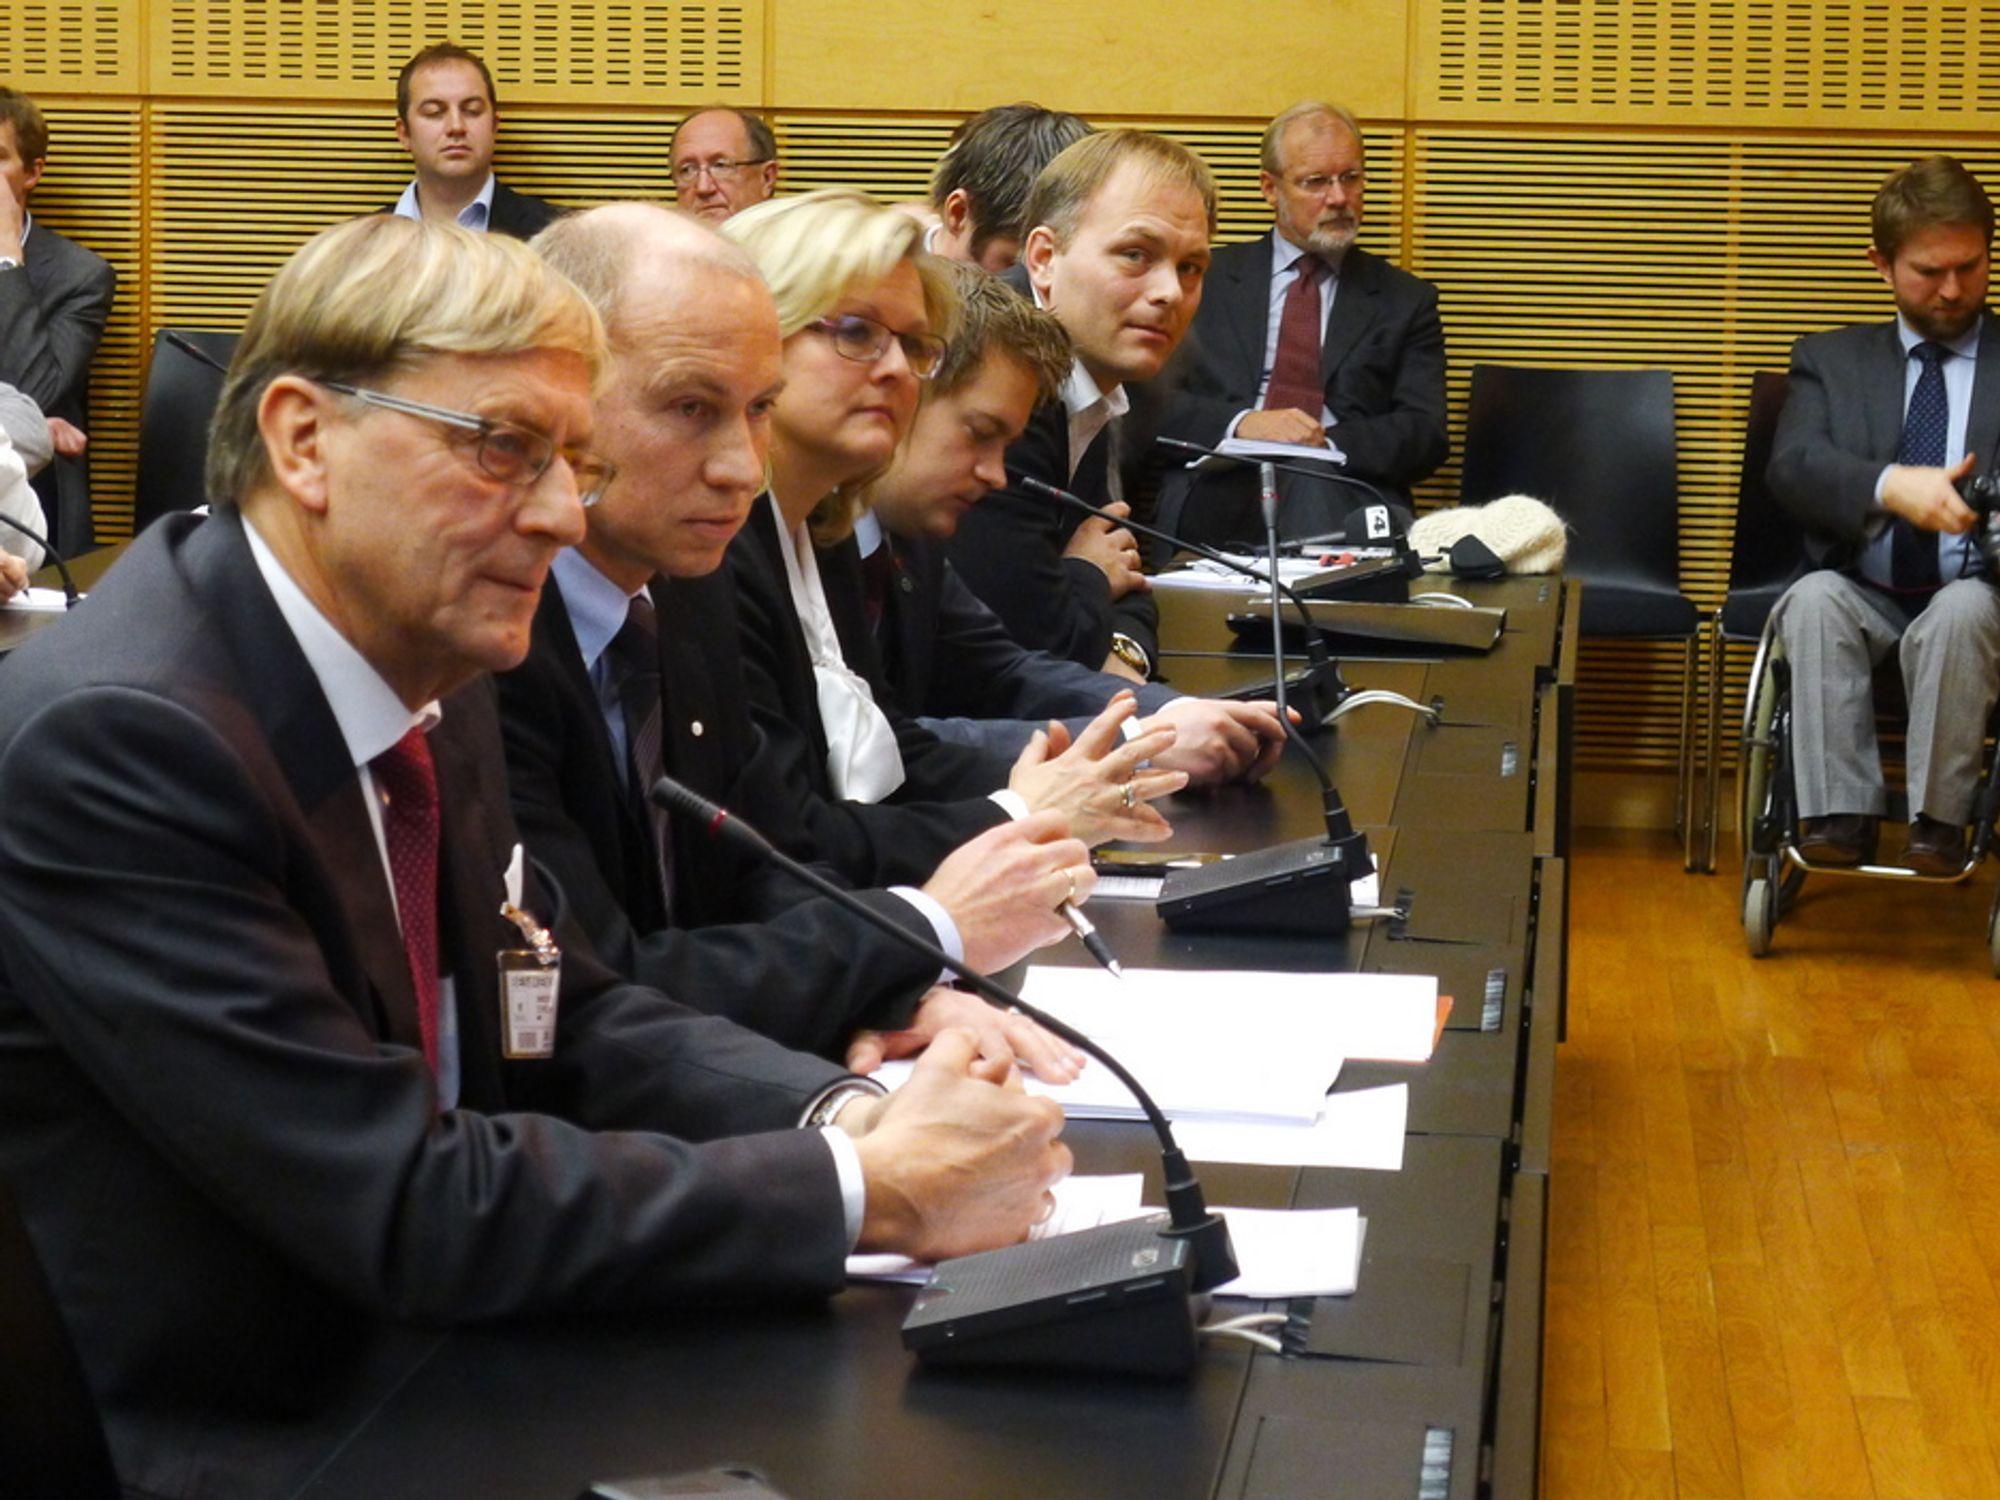 FORNØYDE: Statkrafts styreleder Svein Aaser og konsernsjef  Christian Rynning-Tønnesen  satt på første rad på dagens pressekonferanse.